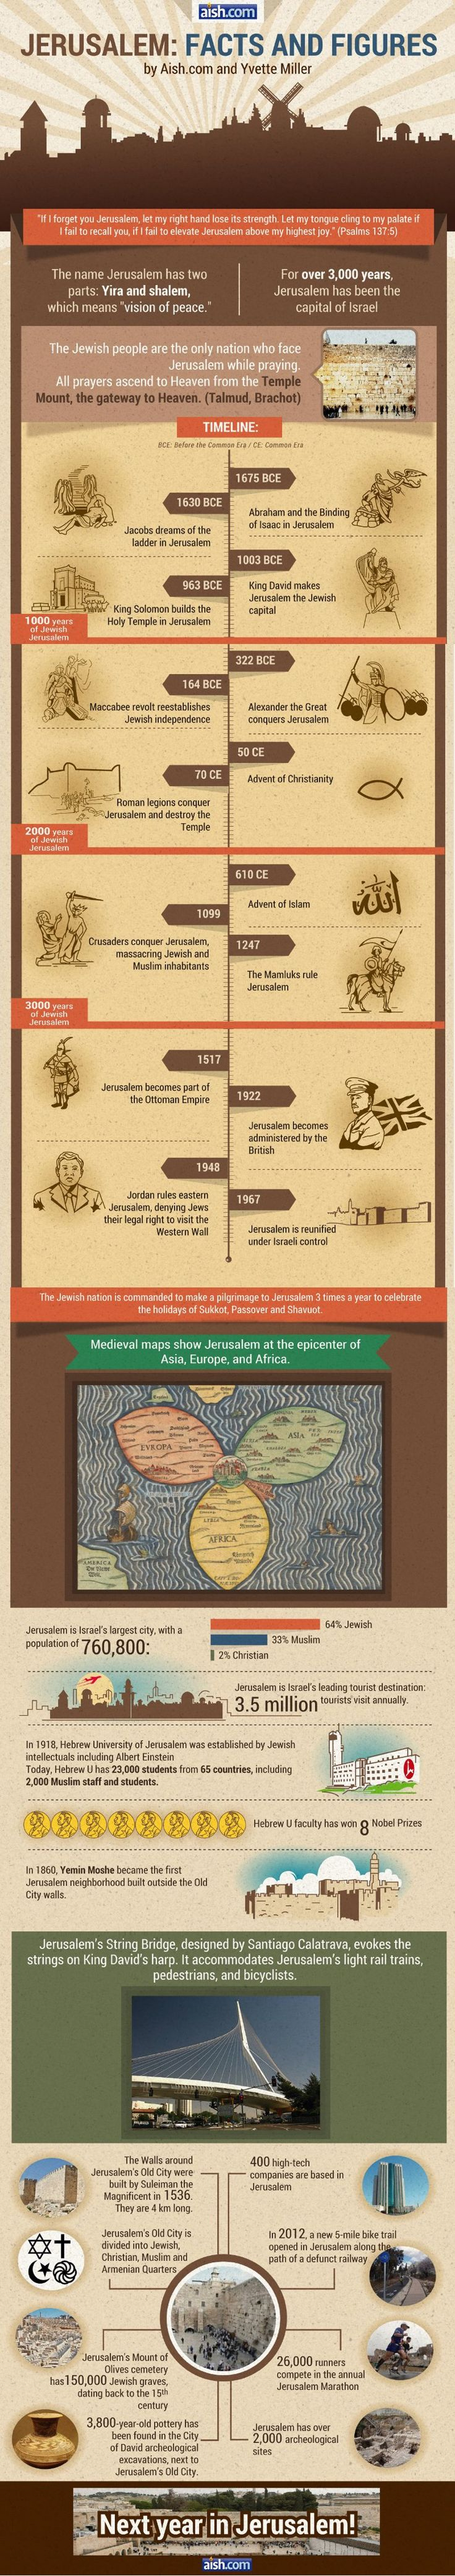 Shema israel bracelet israel bible jewish hebrew prayer kabbalah shma - Jerusalem Facts Figures Israel Historyjewish